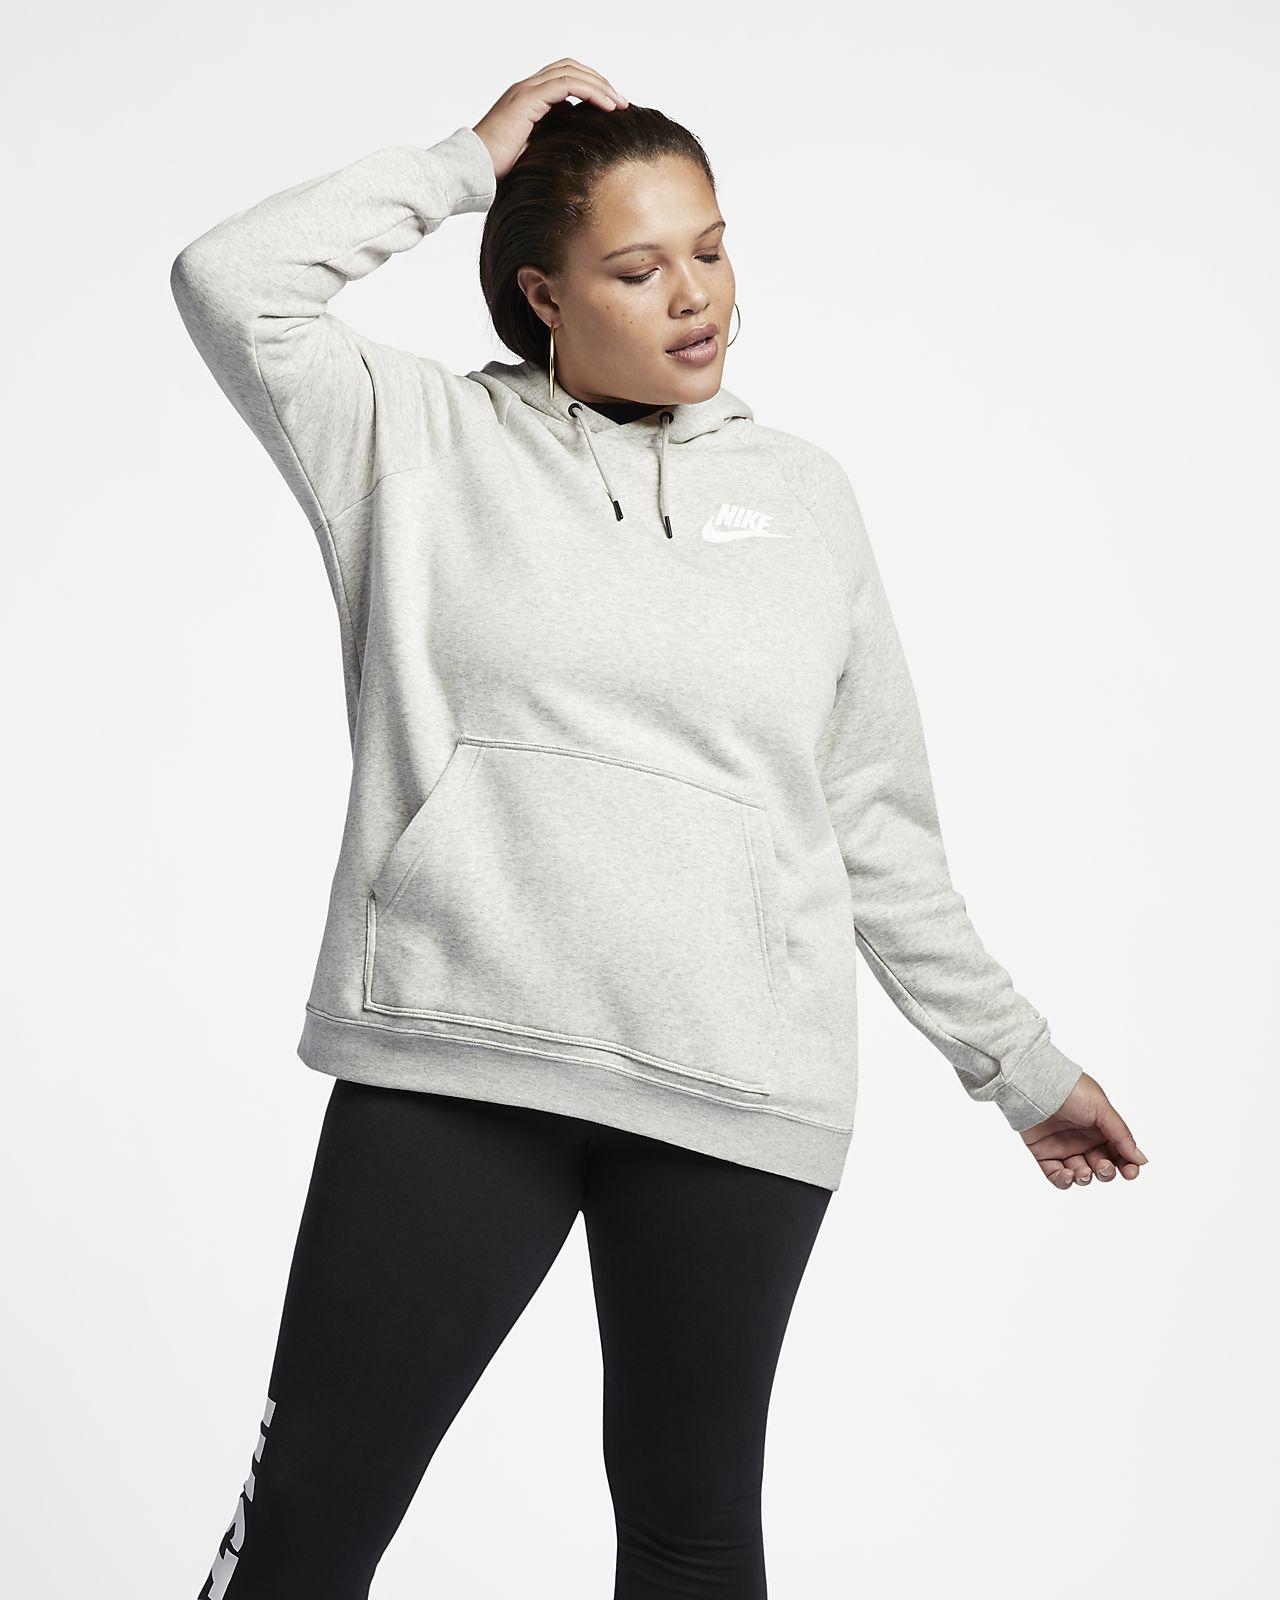 549a087f725 Nike Sportswear Rally Women s Hoodie (Plus Size). Nike.com